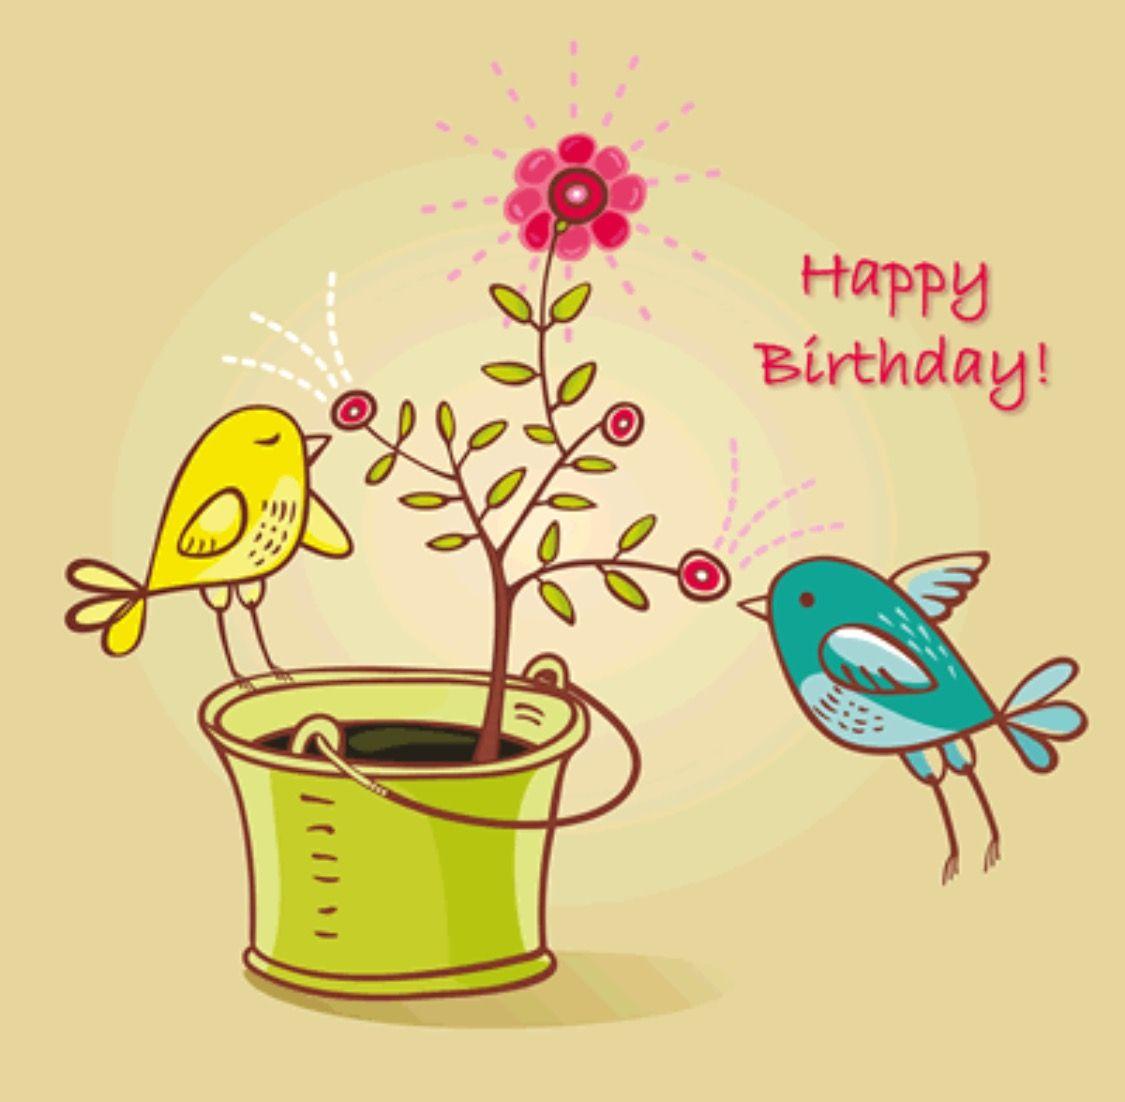 Image By Belinda Jernigan On Happy Birthday